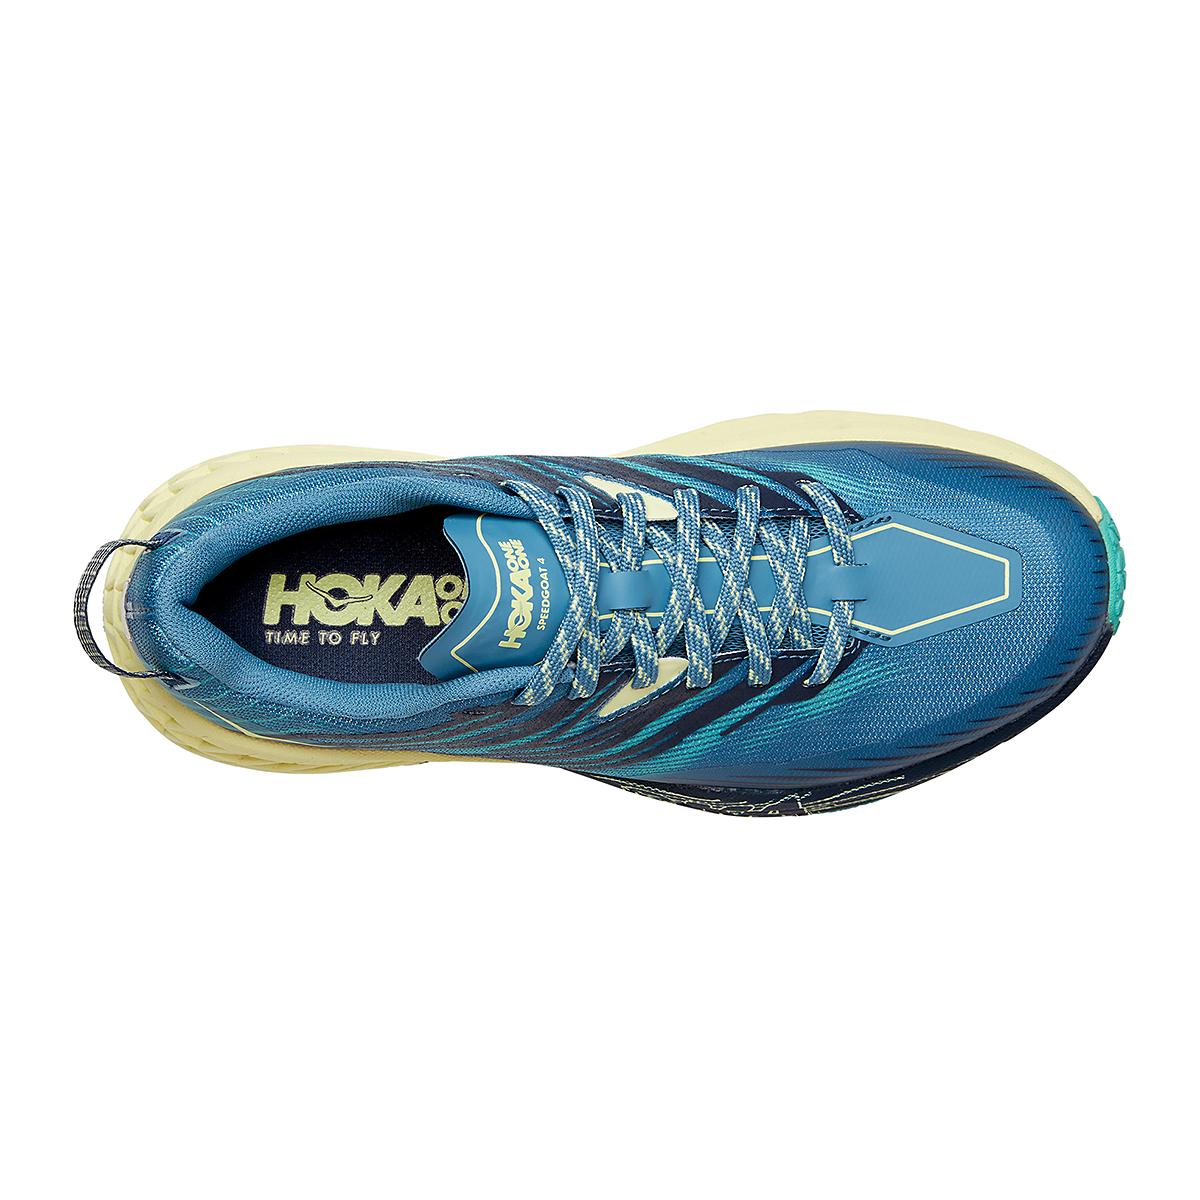 Women's Hoka One One Speedgoat 4 Running Shoe - Color: Provincial Blue/Luminary Green - Size: 5 - Width: Regular, Provincial Blue/Luminary Green, large, image 3